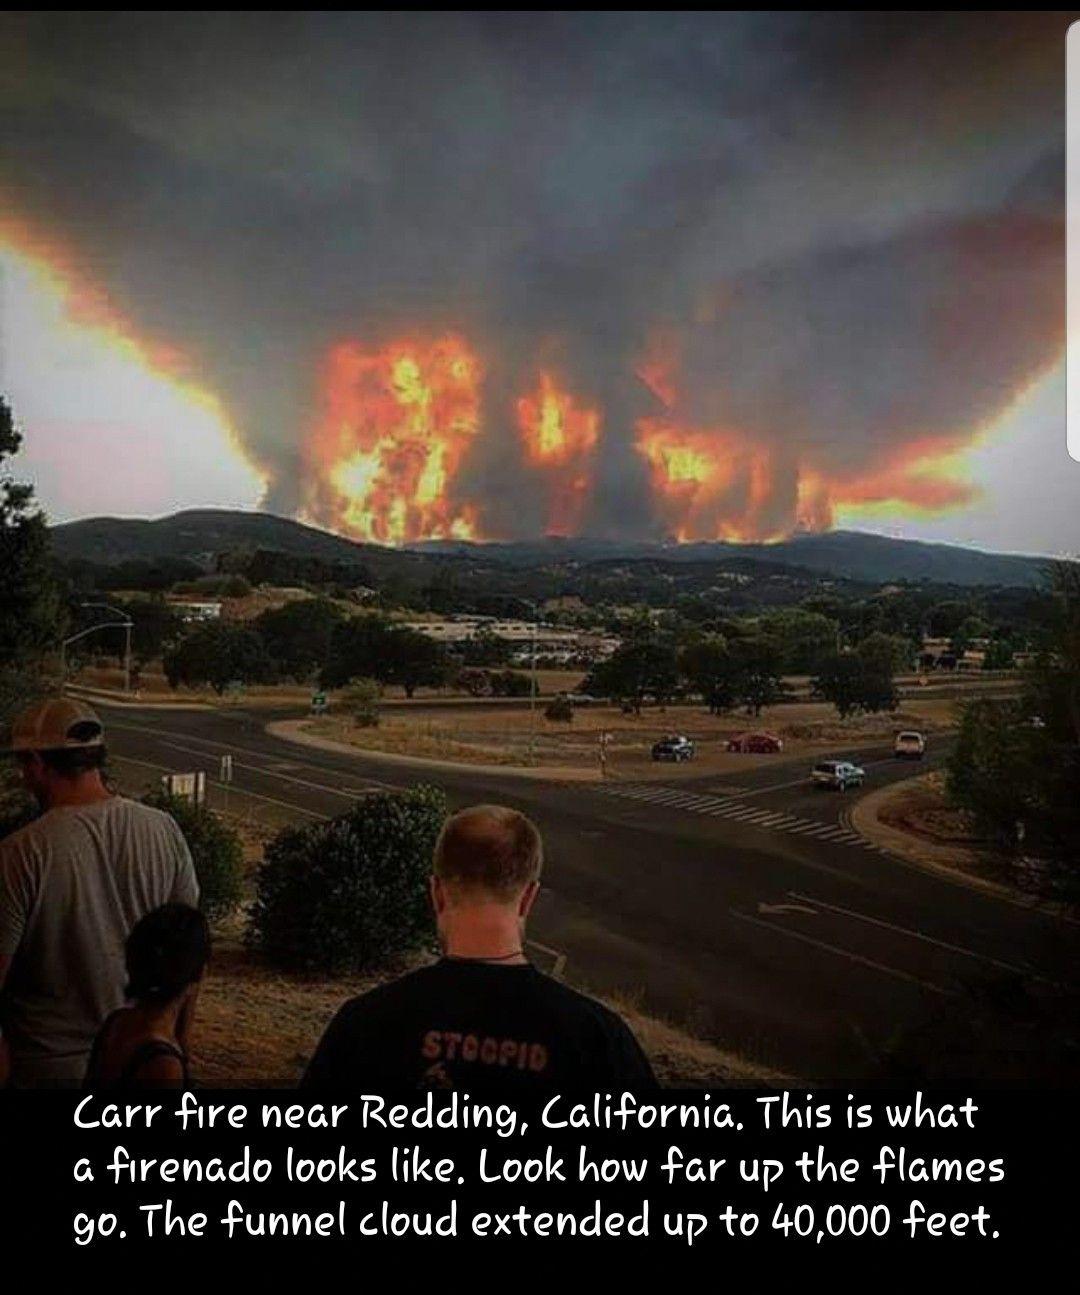 Carr Fire Redding California August 2018 Fire It Up